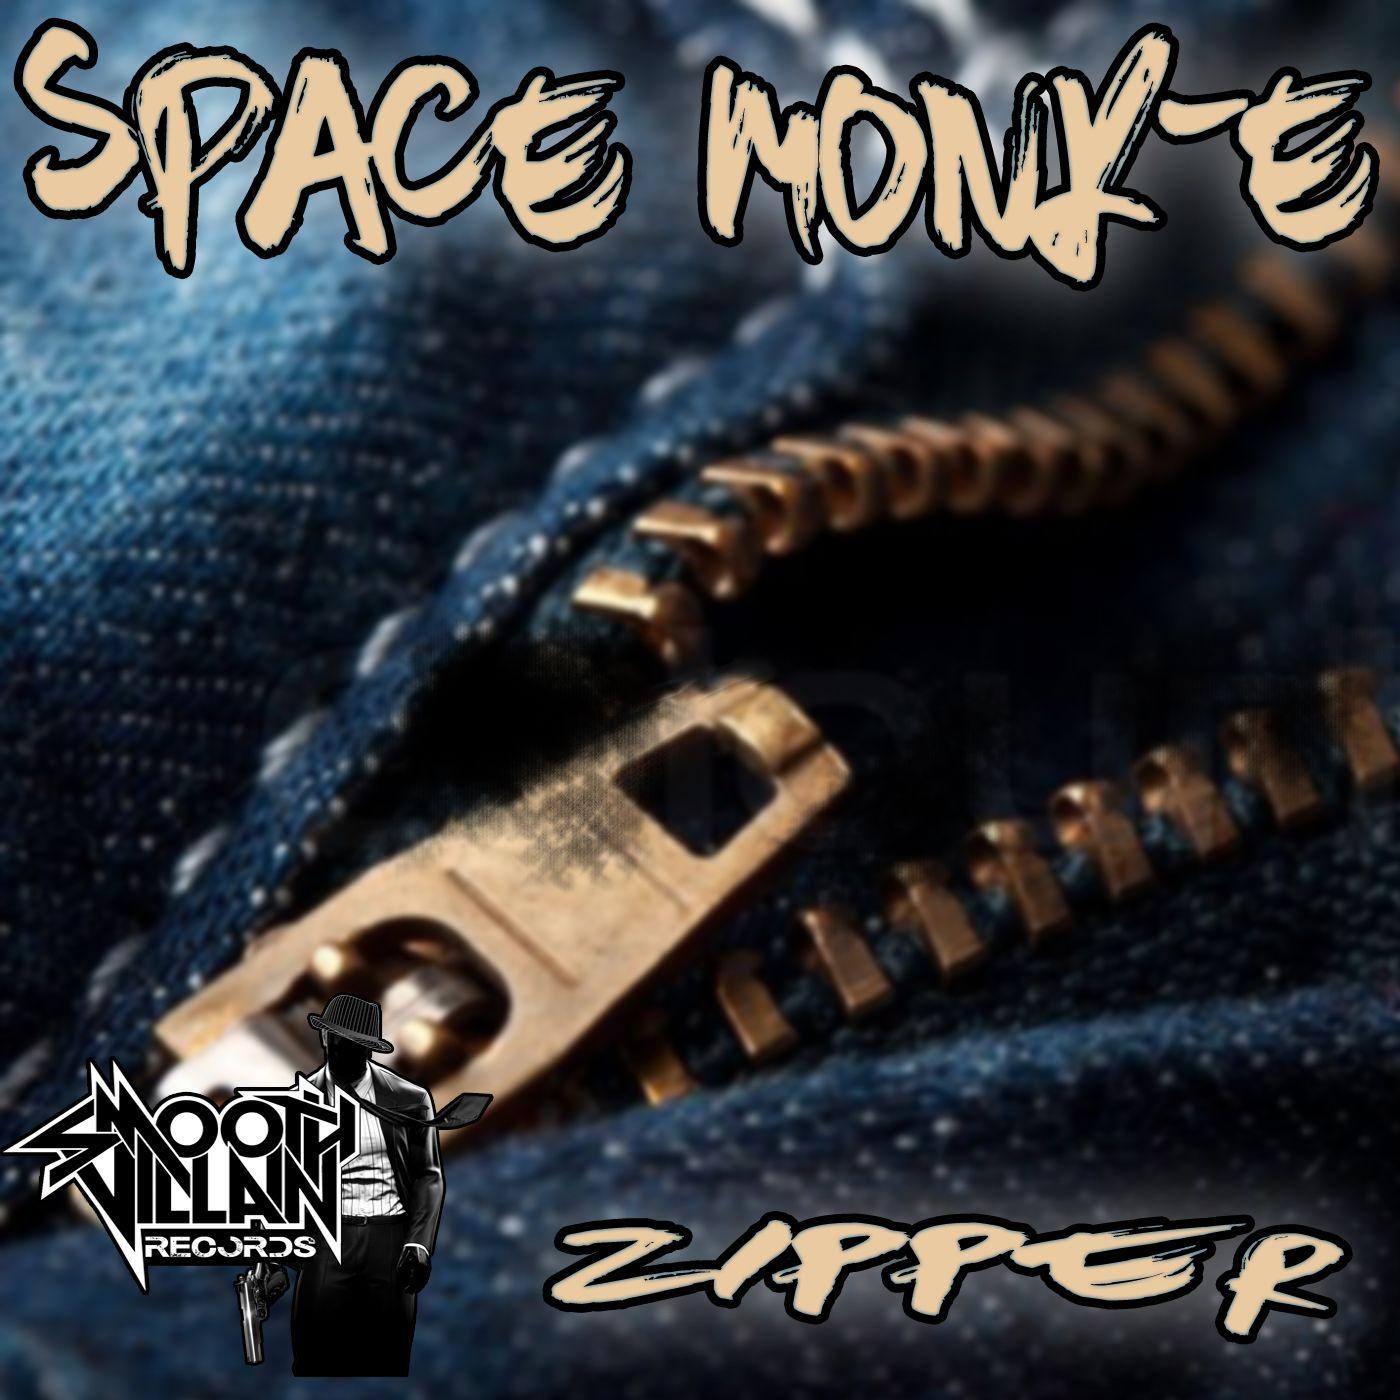 space_monk-e_-_zipper.jpg